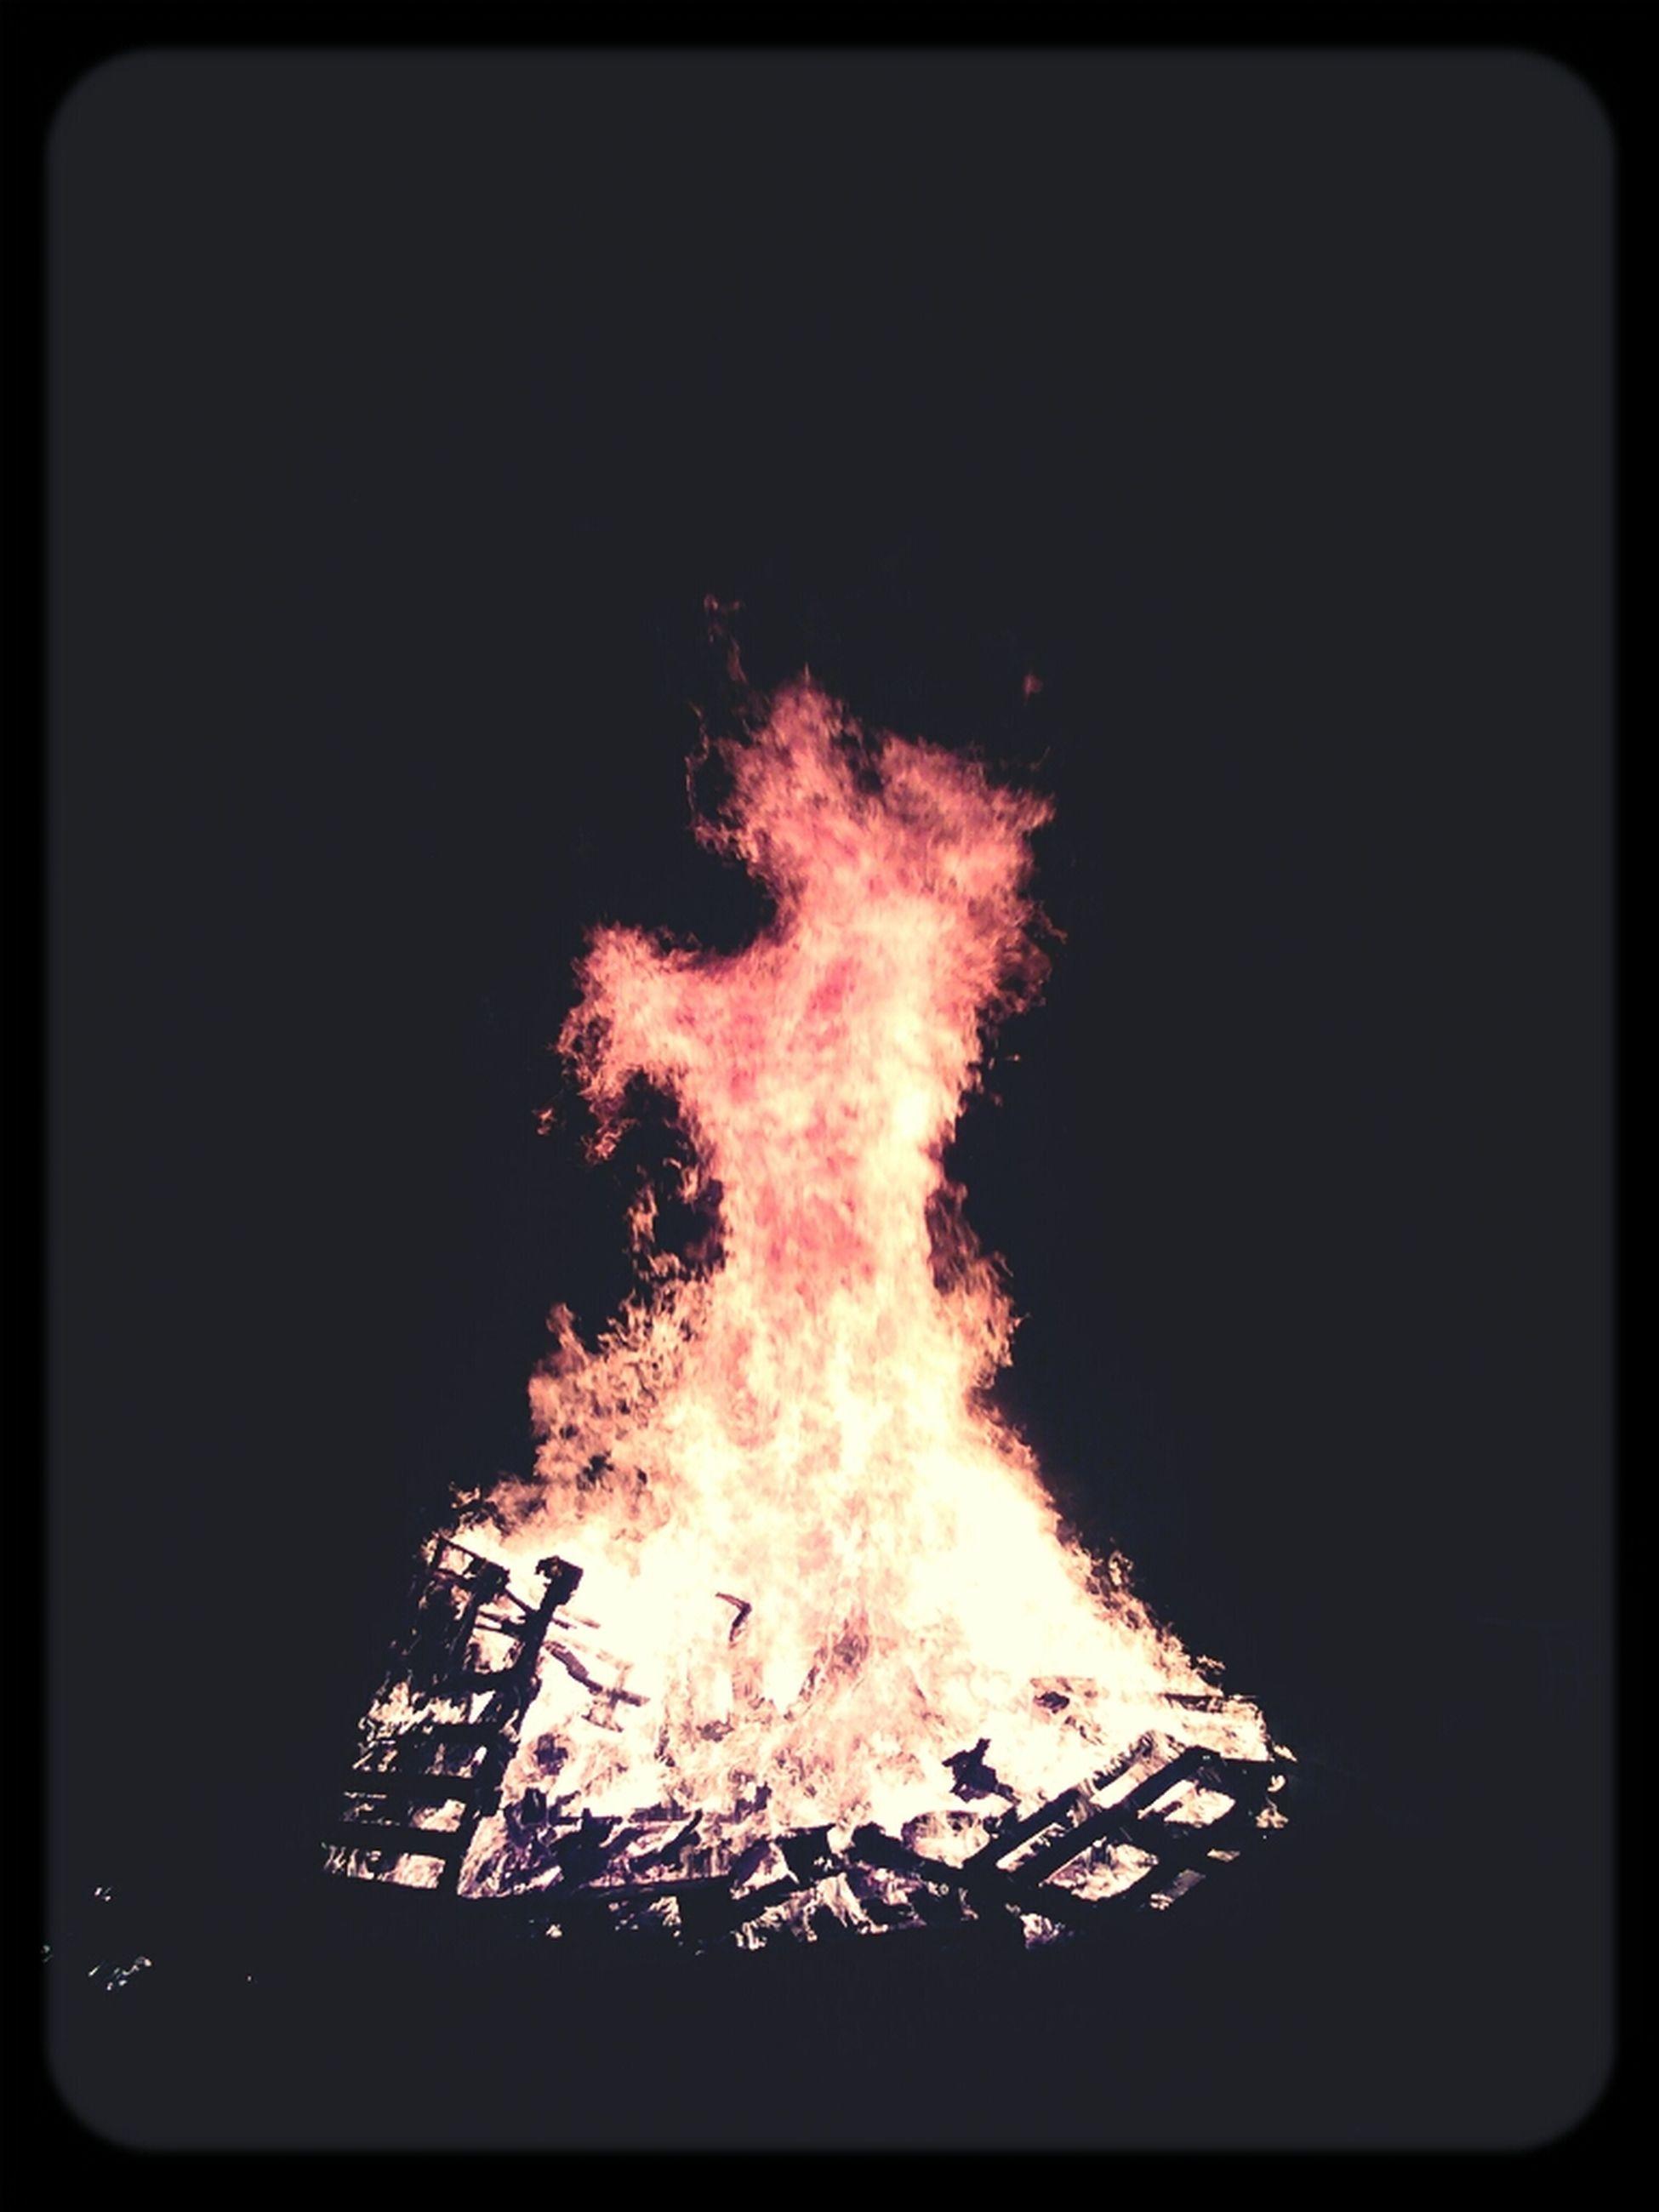 burning, flame, fire - natural phenomenon, heat - temperature, night, glowing, transfer print, bonfire, dark, fire, illuminated, copy space, auto post production filter, close-up, black background, light - natural phenomenon, firewood, heat, campfire, motion